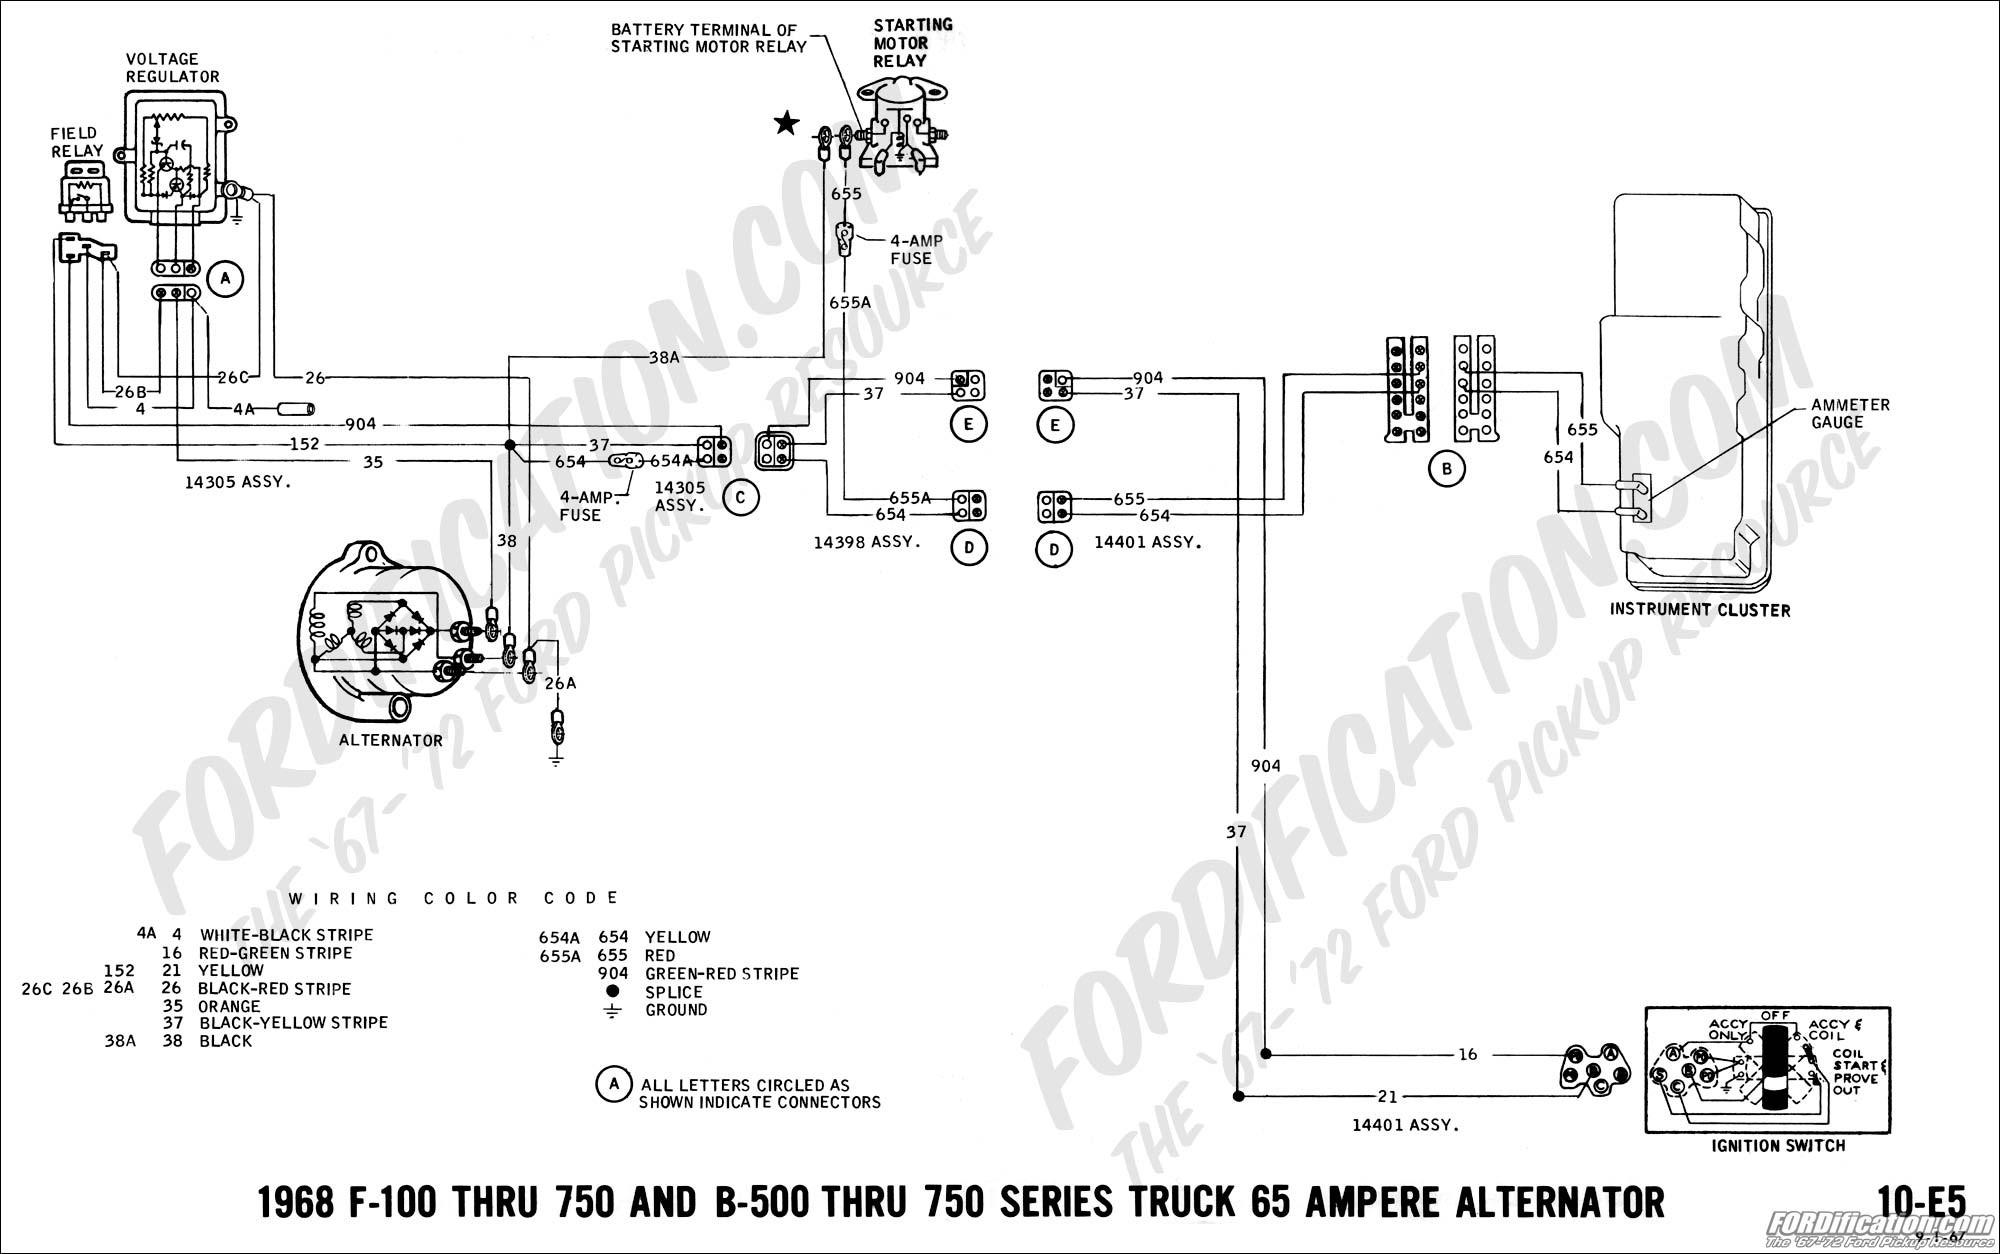 Chevy Alternator Parts Diagram Schematics 82 Wiring Electrical Diagrams 89 350